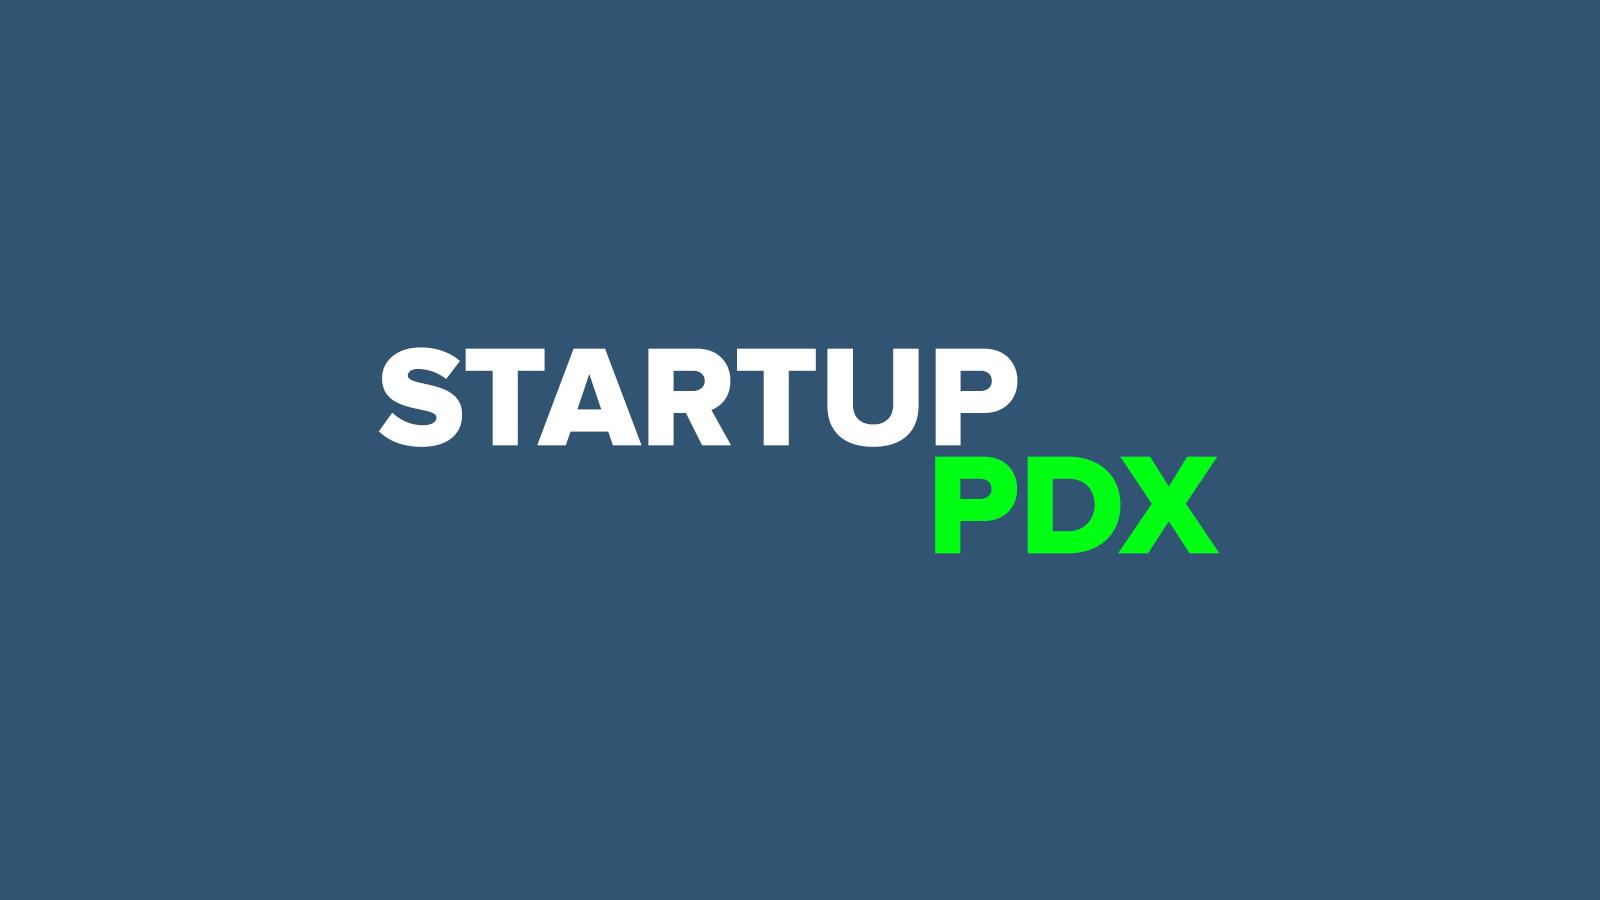 Startup PDX